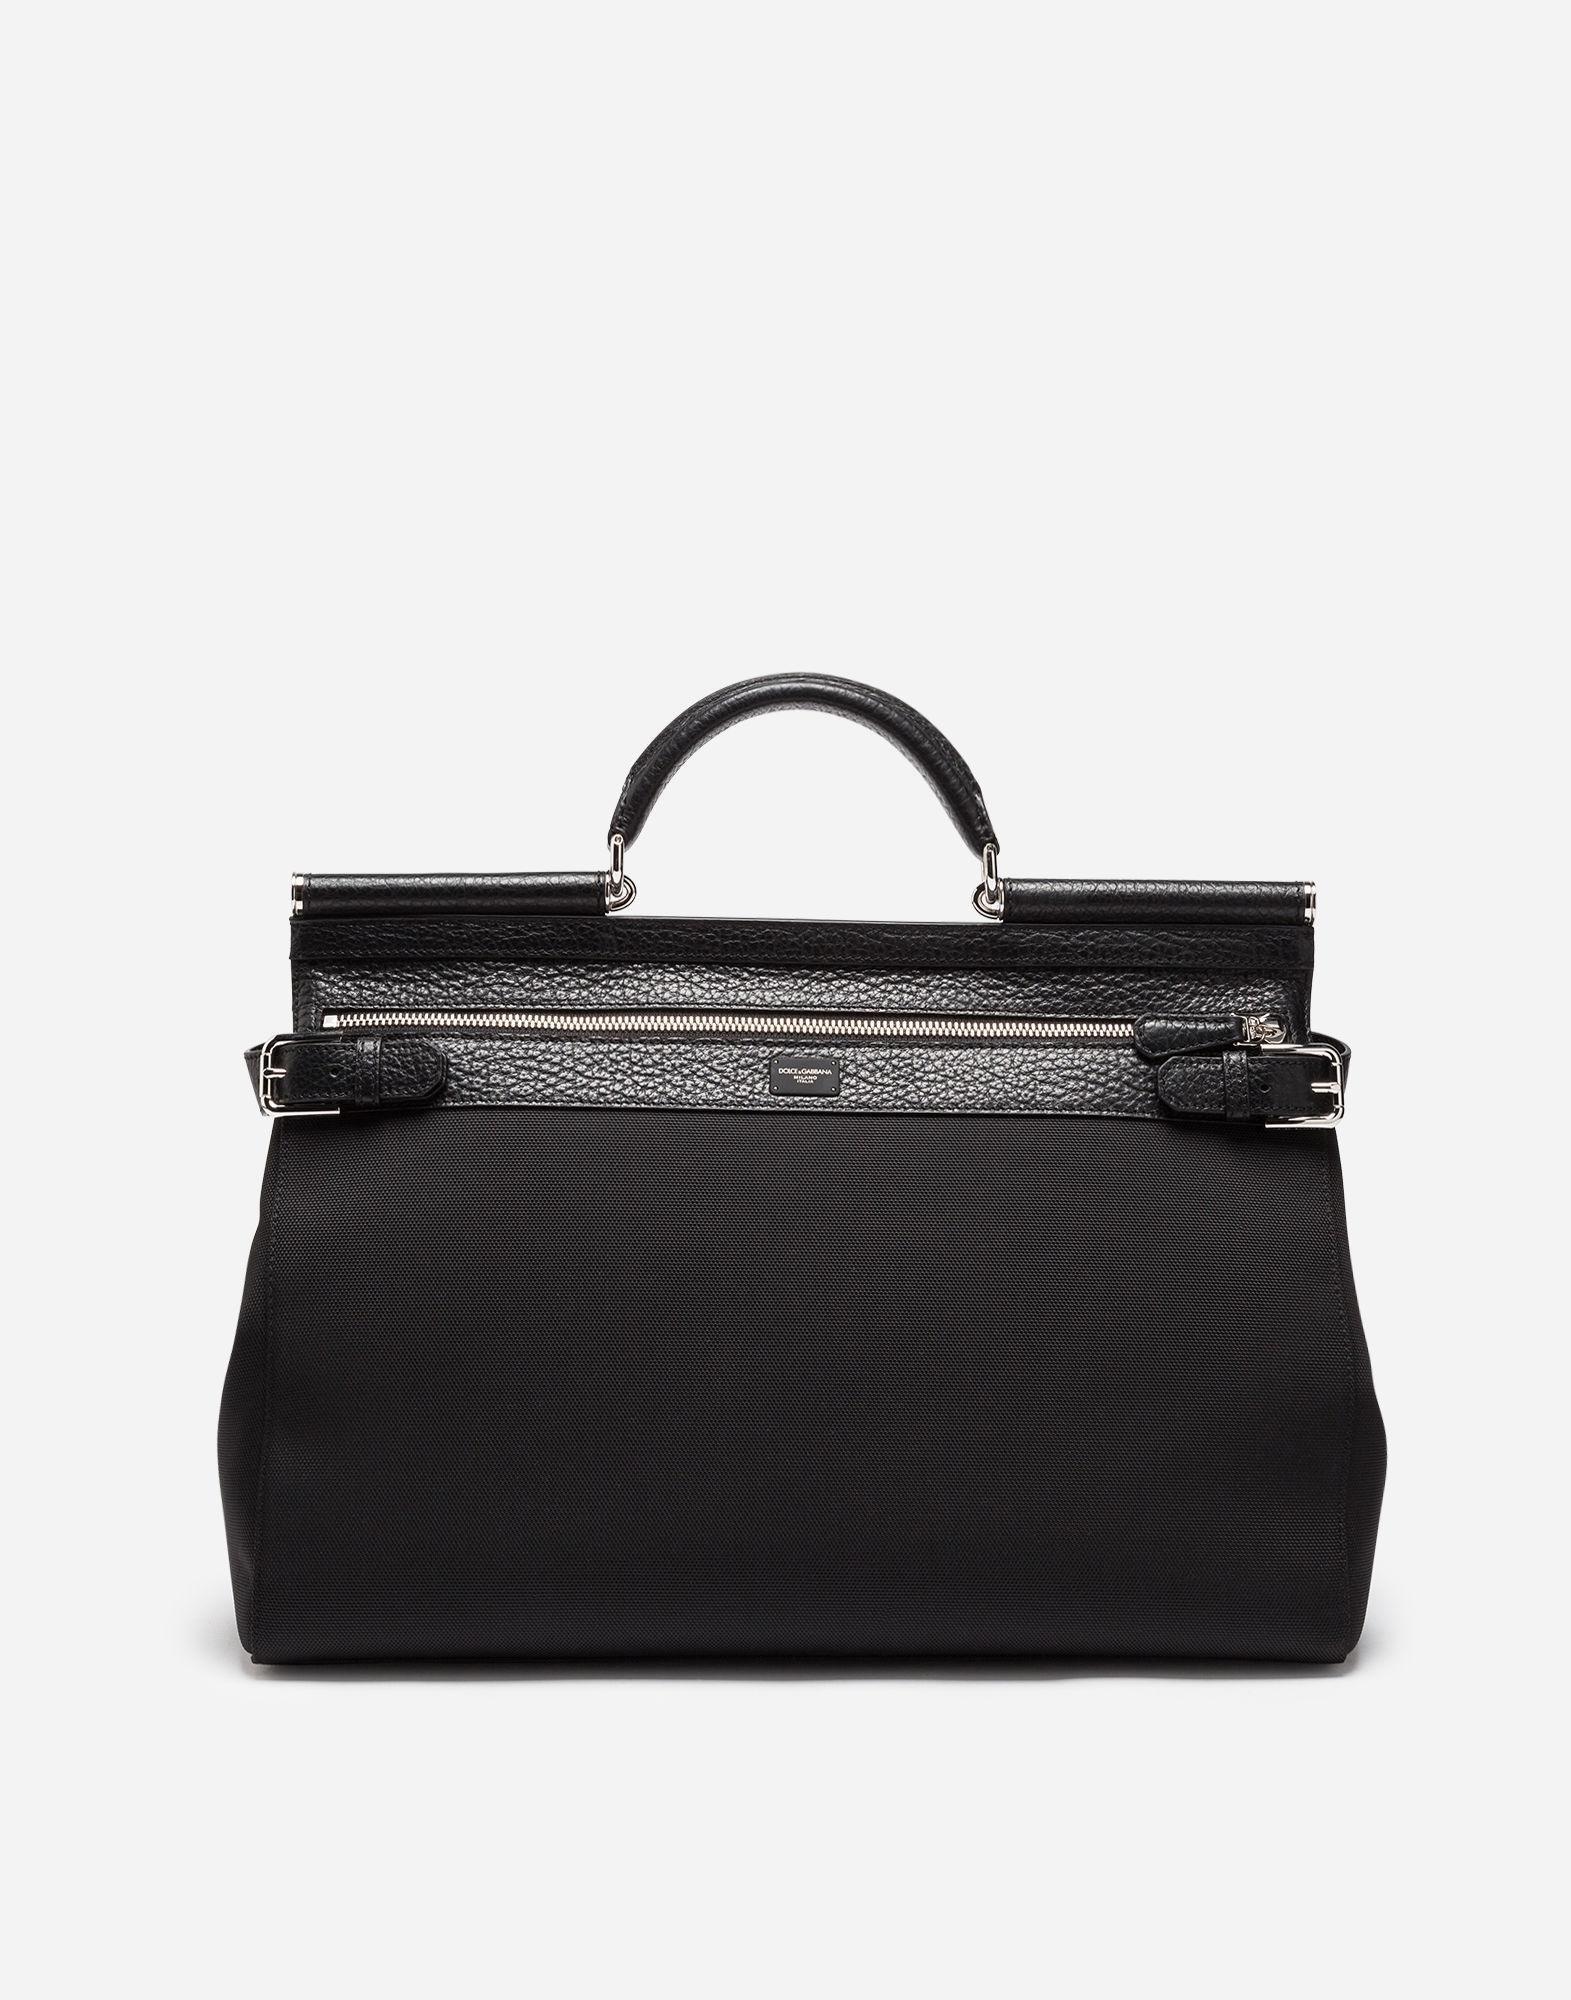 Lyst - Dolce   Gabbana Handheld Sicily Bag In Canvas in Black ecb209516f850